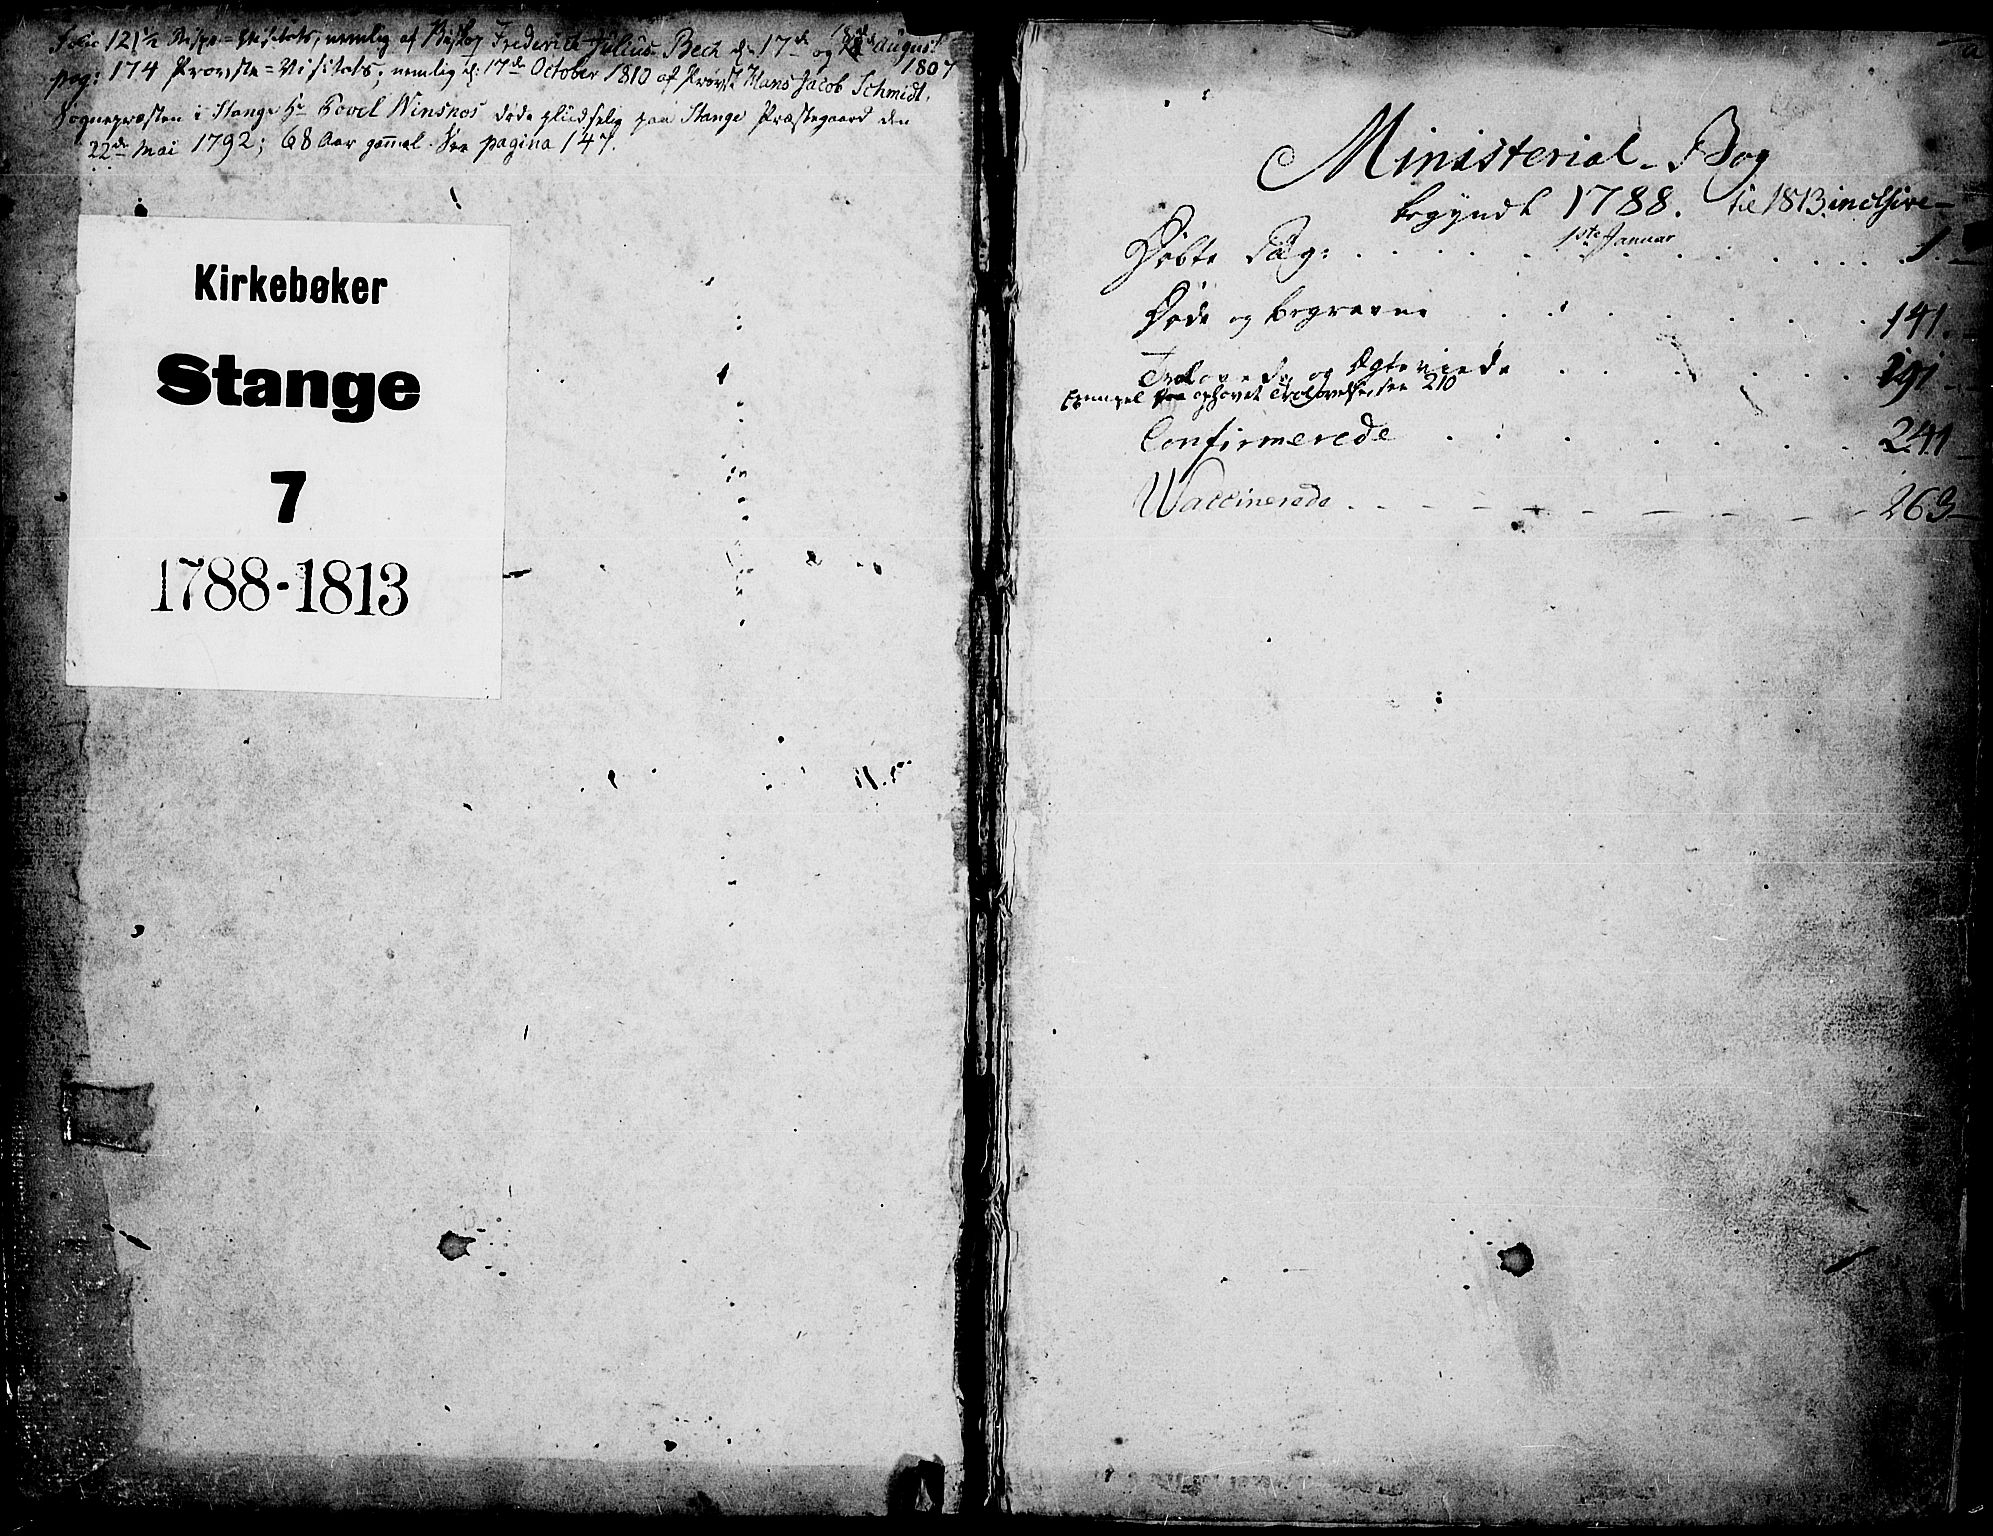 SAH, Stange prestekontor, K/L0007: Ministerialbok nr. 7, 1788-1813